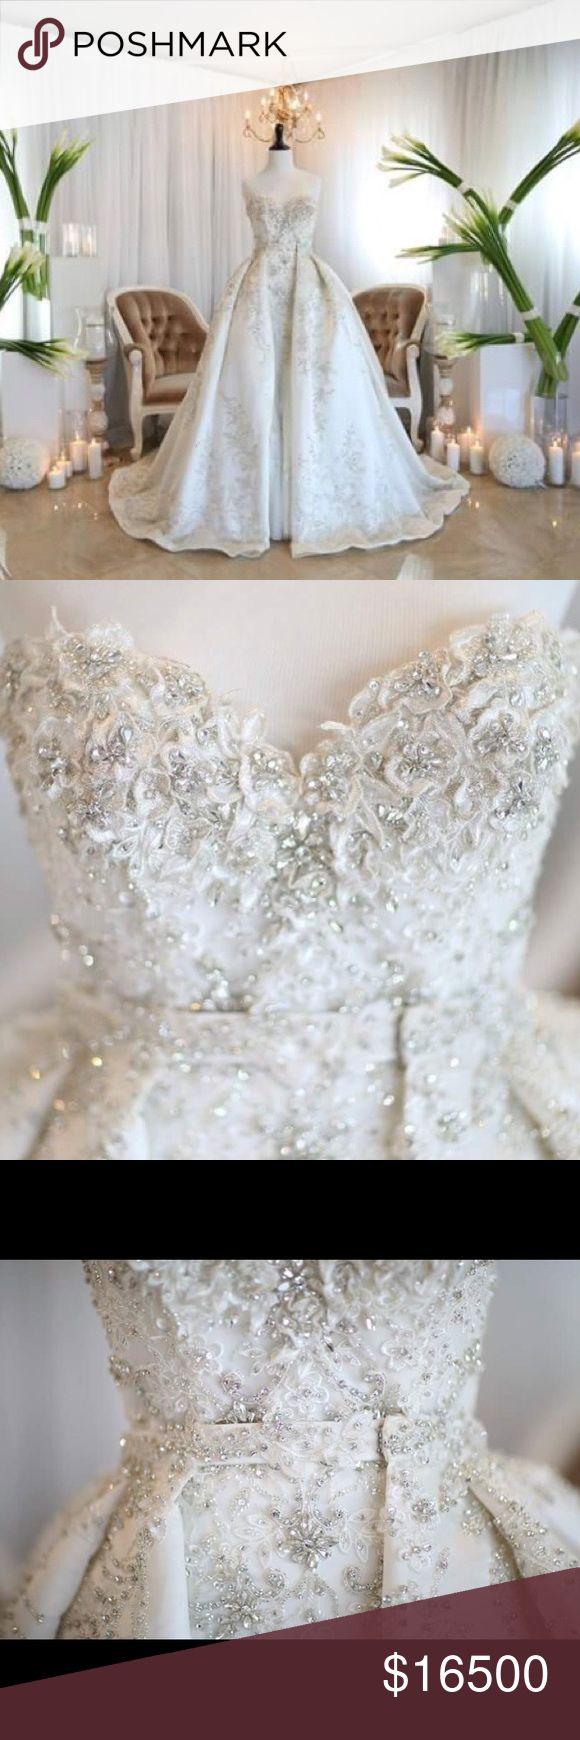 Wedding Dress mermaid ball gown Stephen Yearick Designer Wedding Gown mermaid dress with ball gown removable skirt by designer Stephen Yearick. stephan yearick Dresses Wedding